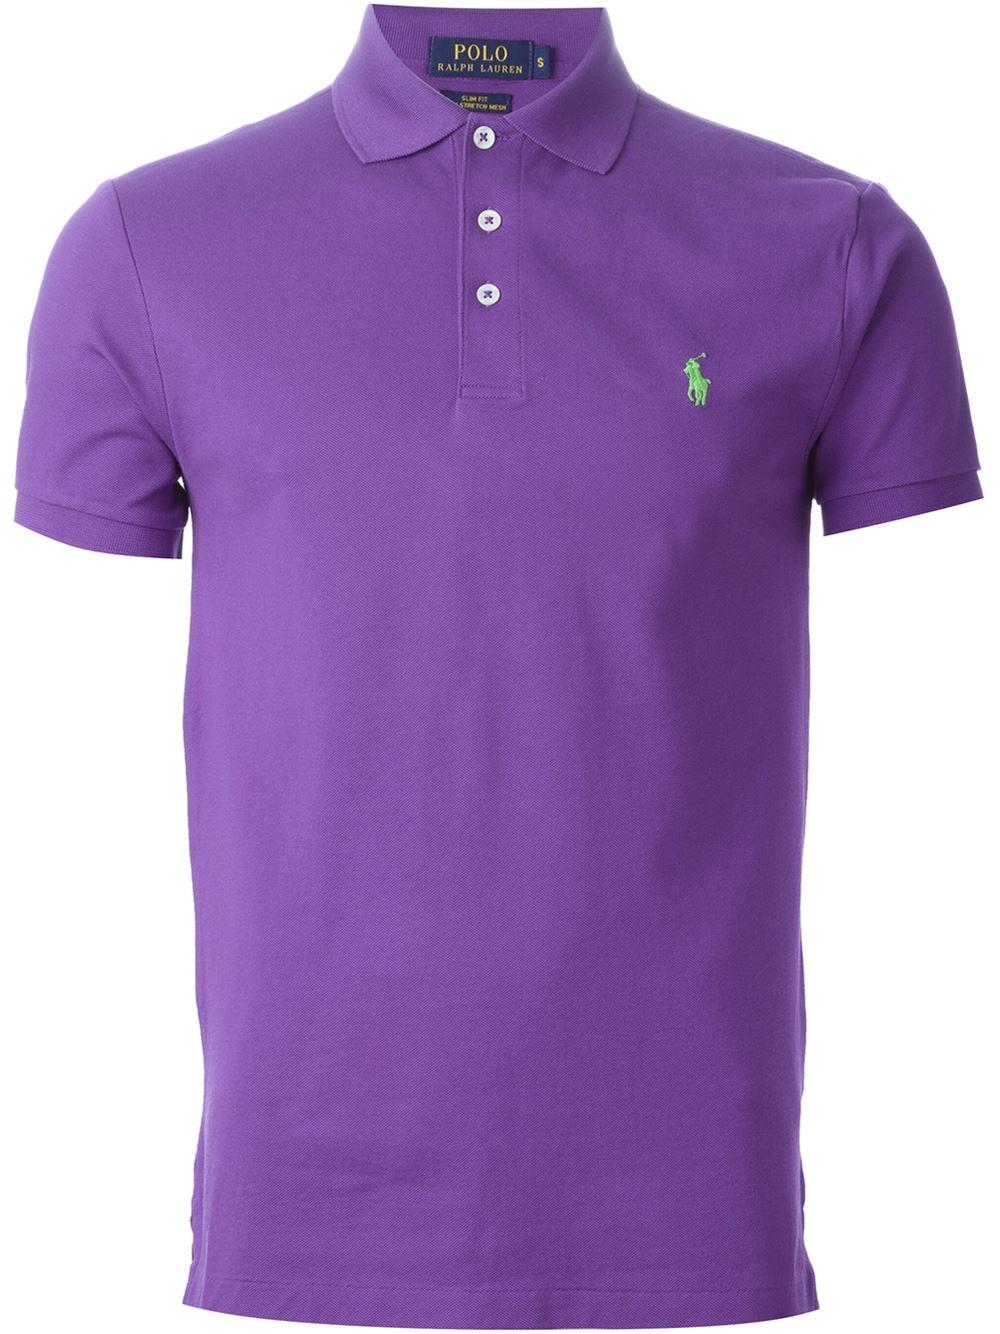 Polo ralph lauren embroidered logo polo shirt in purple for Ralph lauren logo shirt